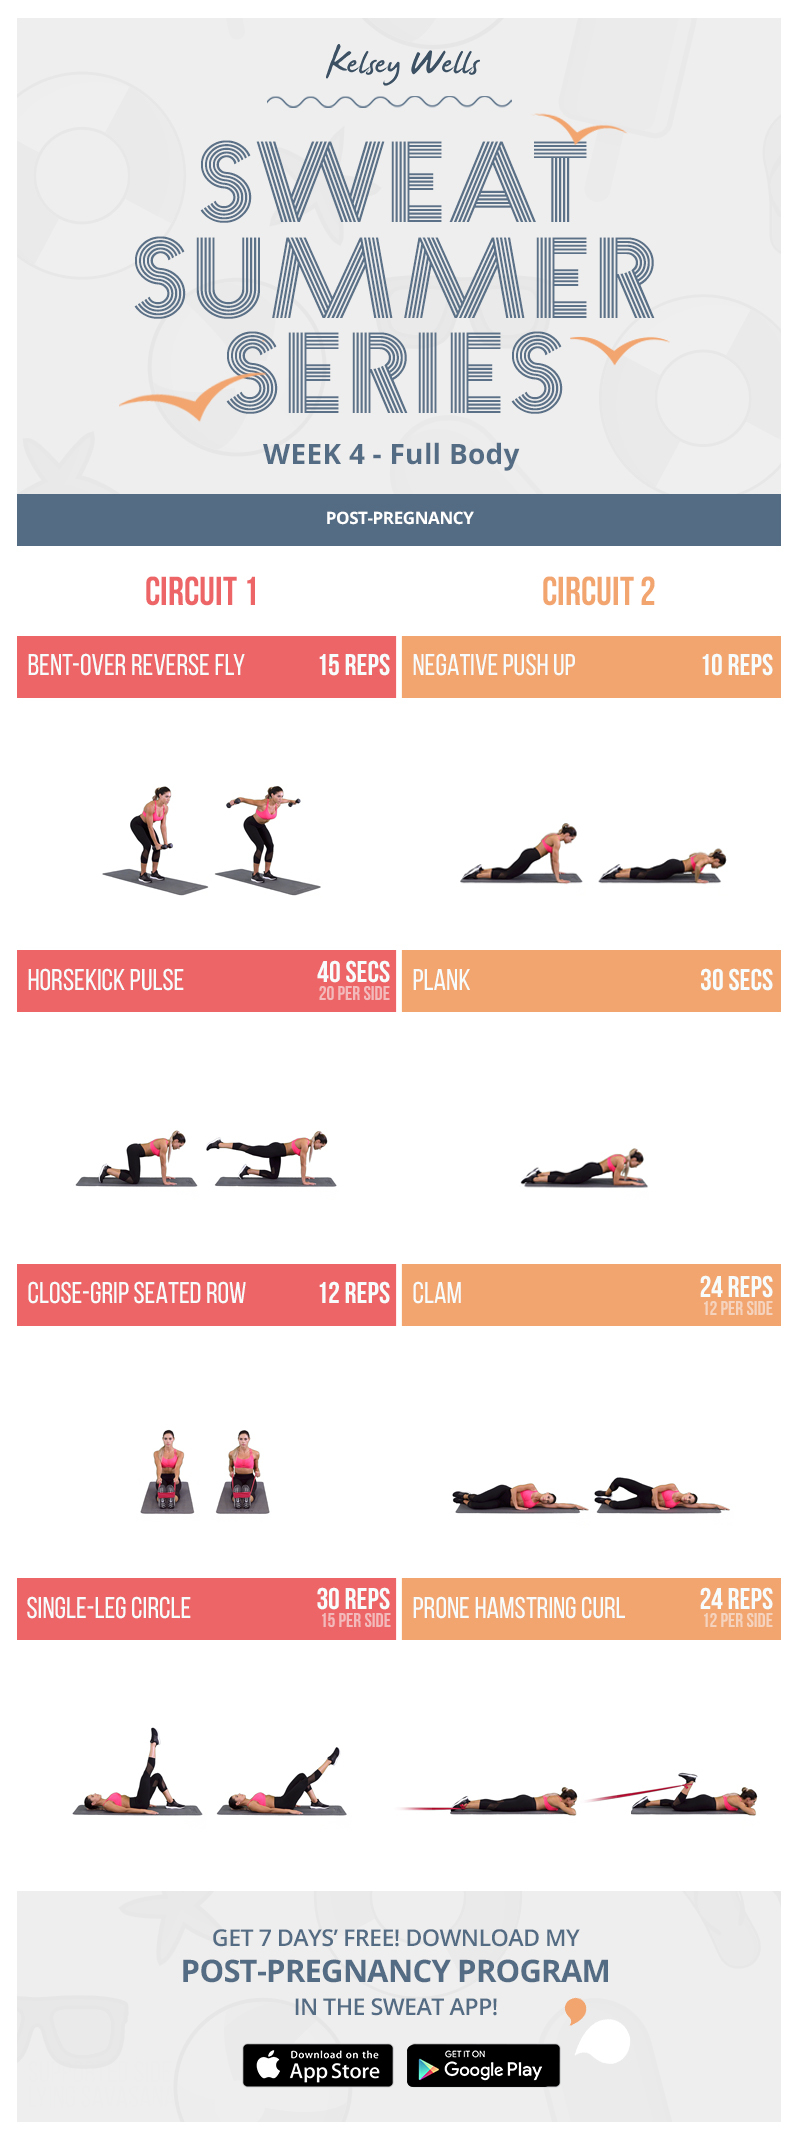 Full Body Post-pregnancy workout